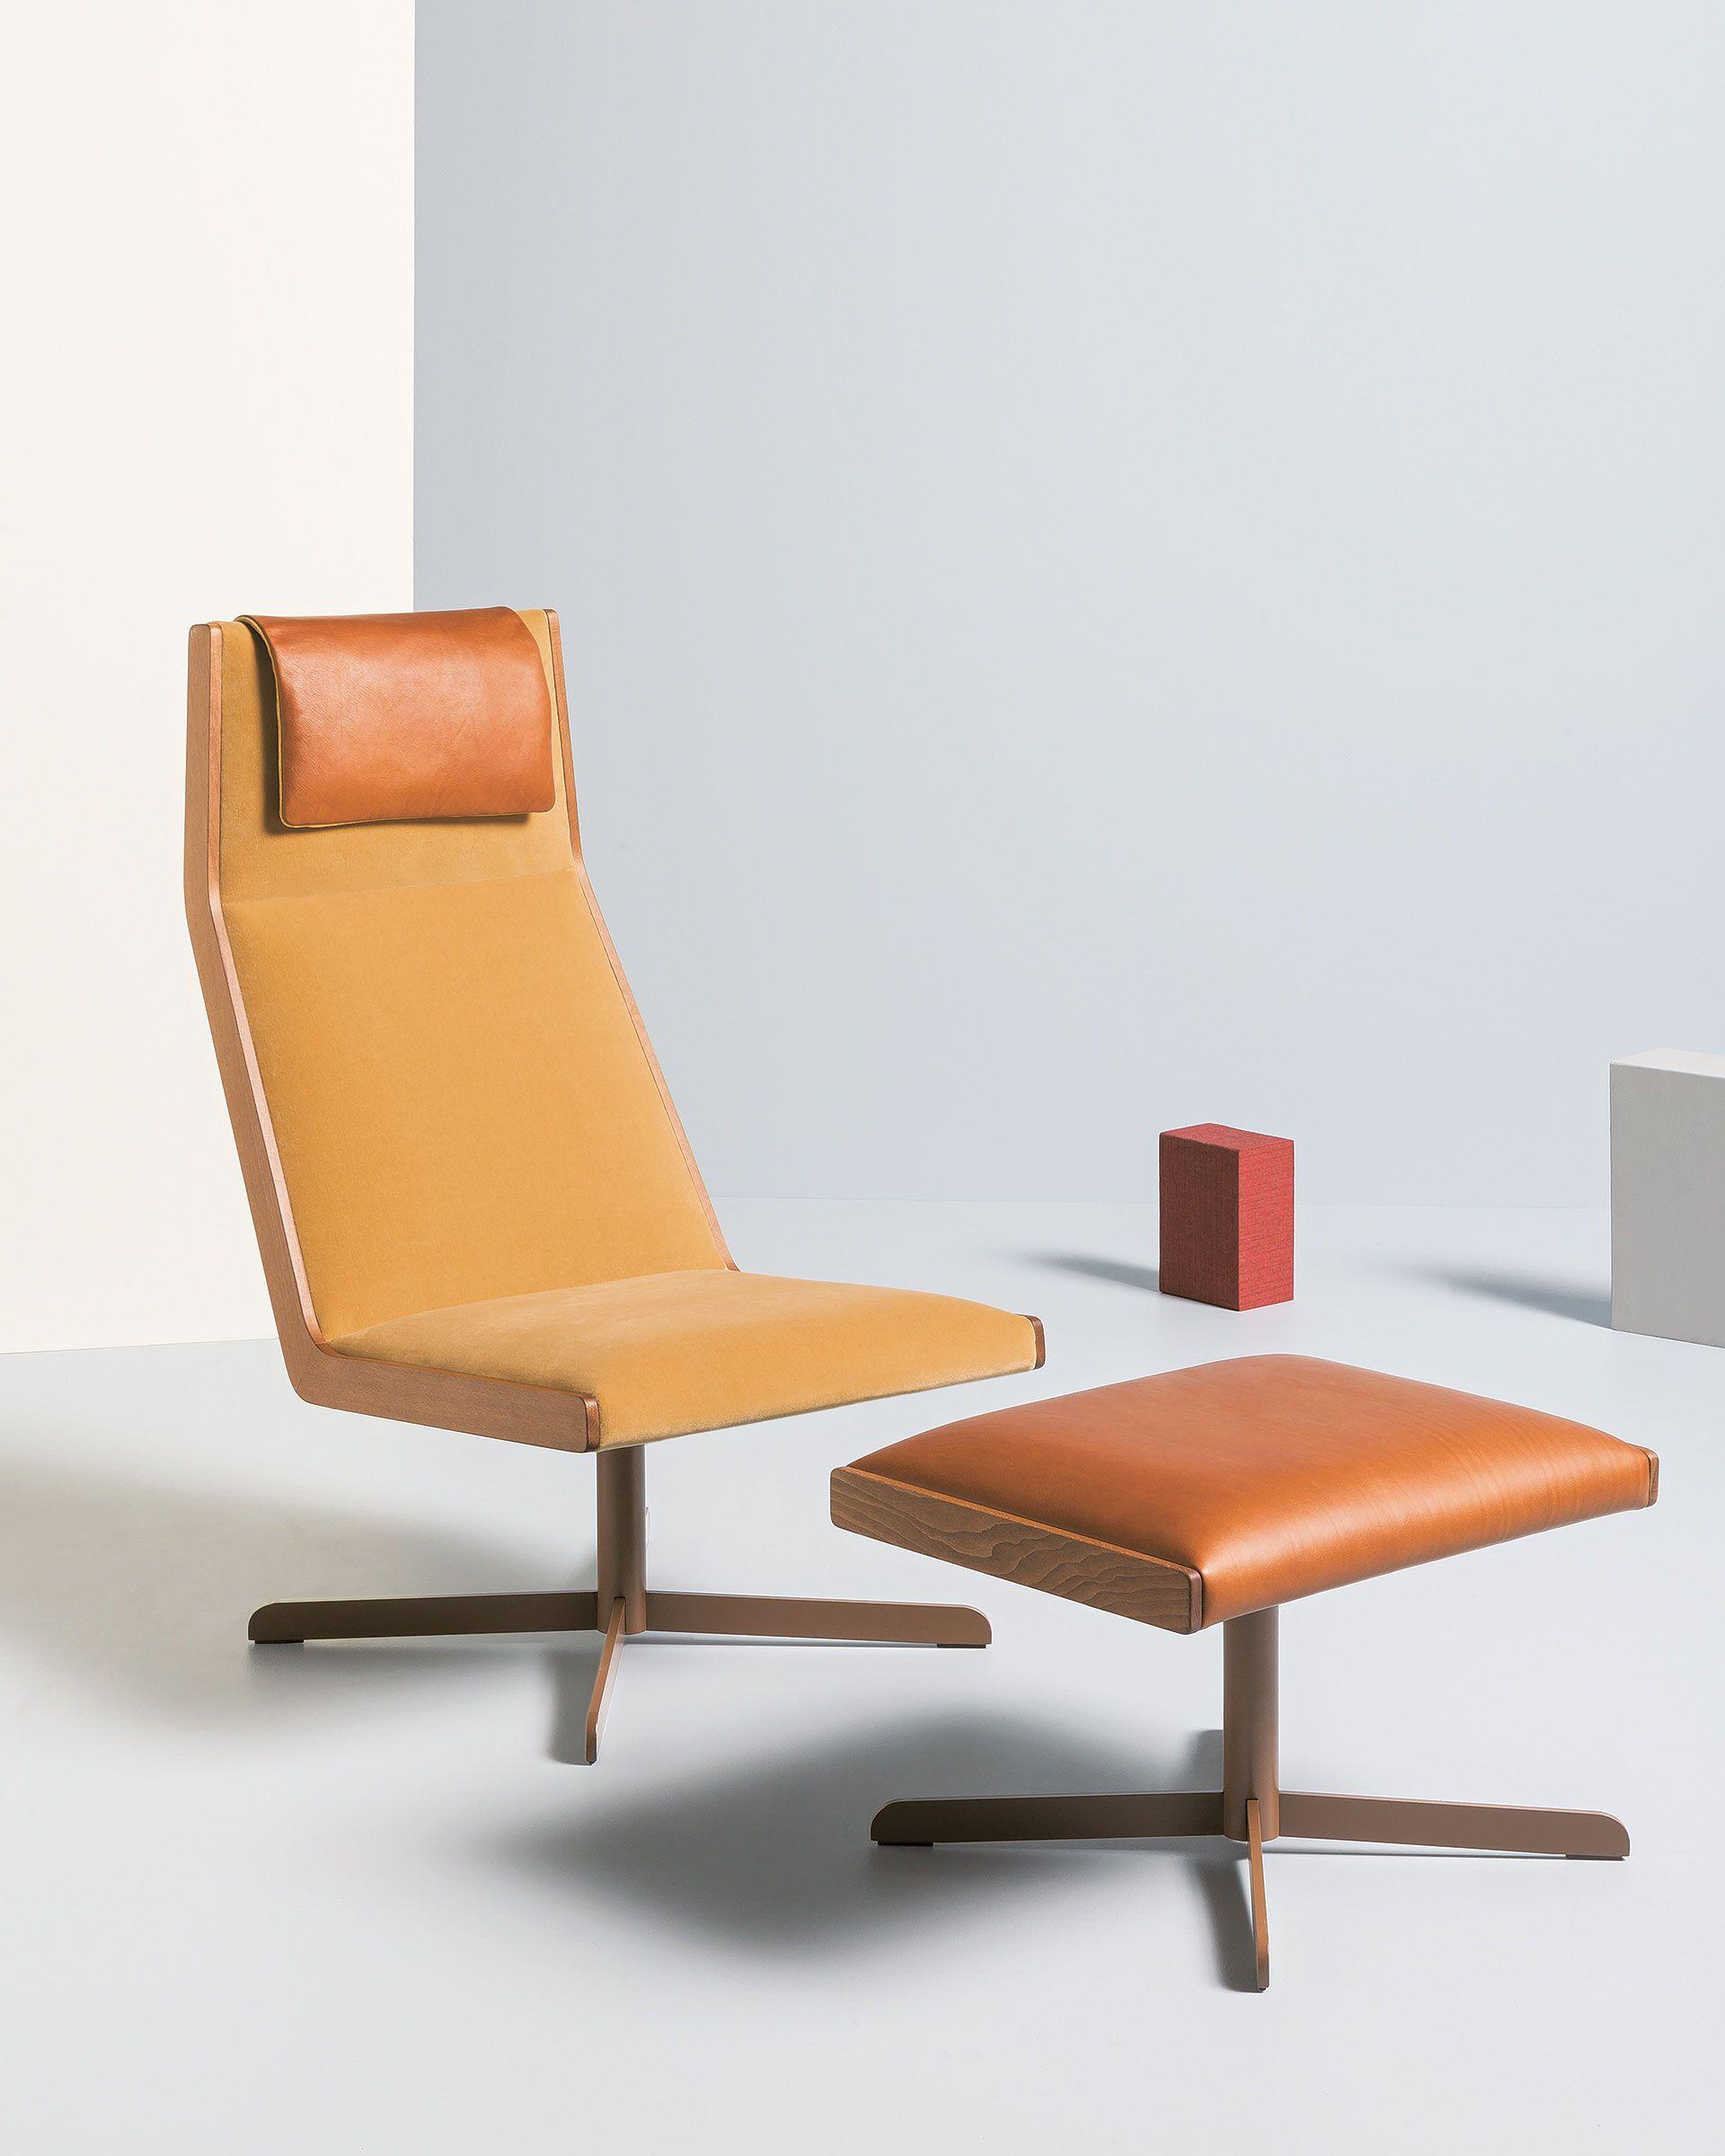 Stilo Cantarutti Outdoor furniture, Furniture, Flooring